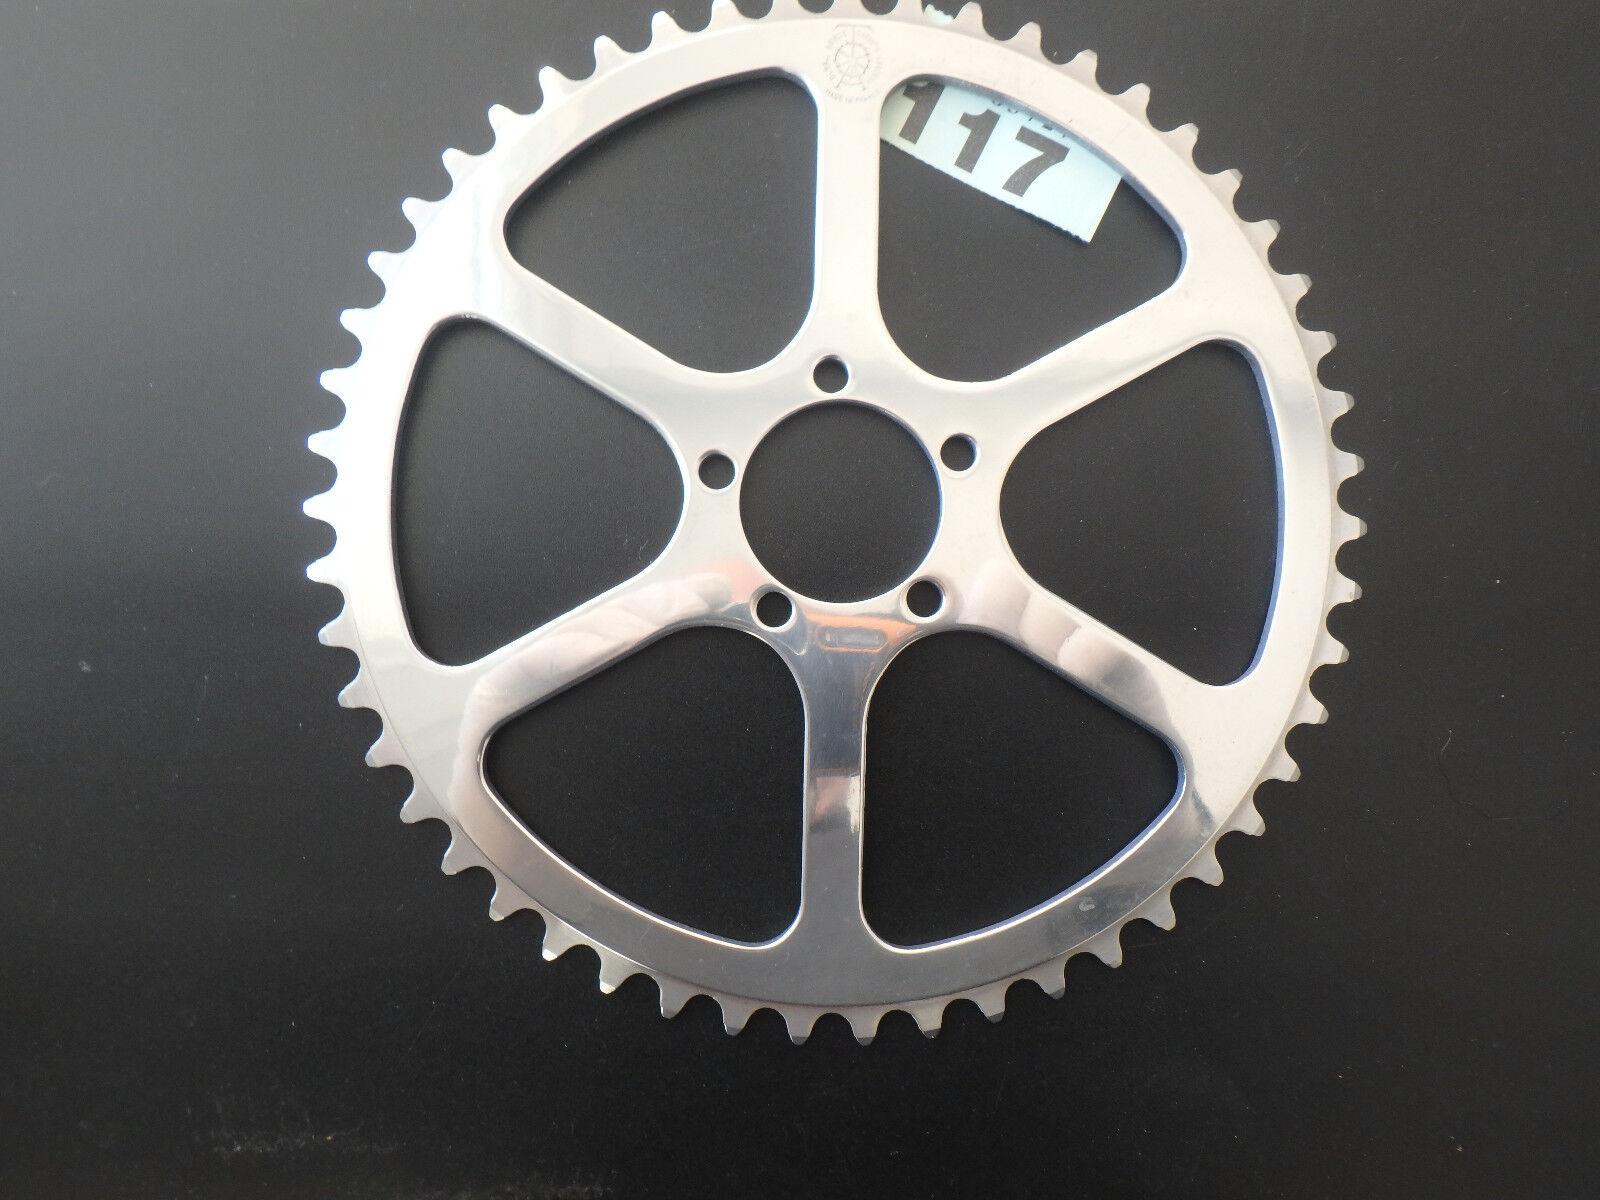 NOS - Spécialités T.A. Cyclotouriste 5 Bolts Road Chainring 51, 54 or 55t 3 32